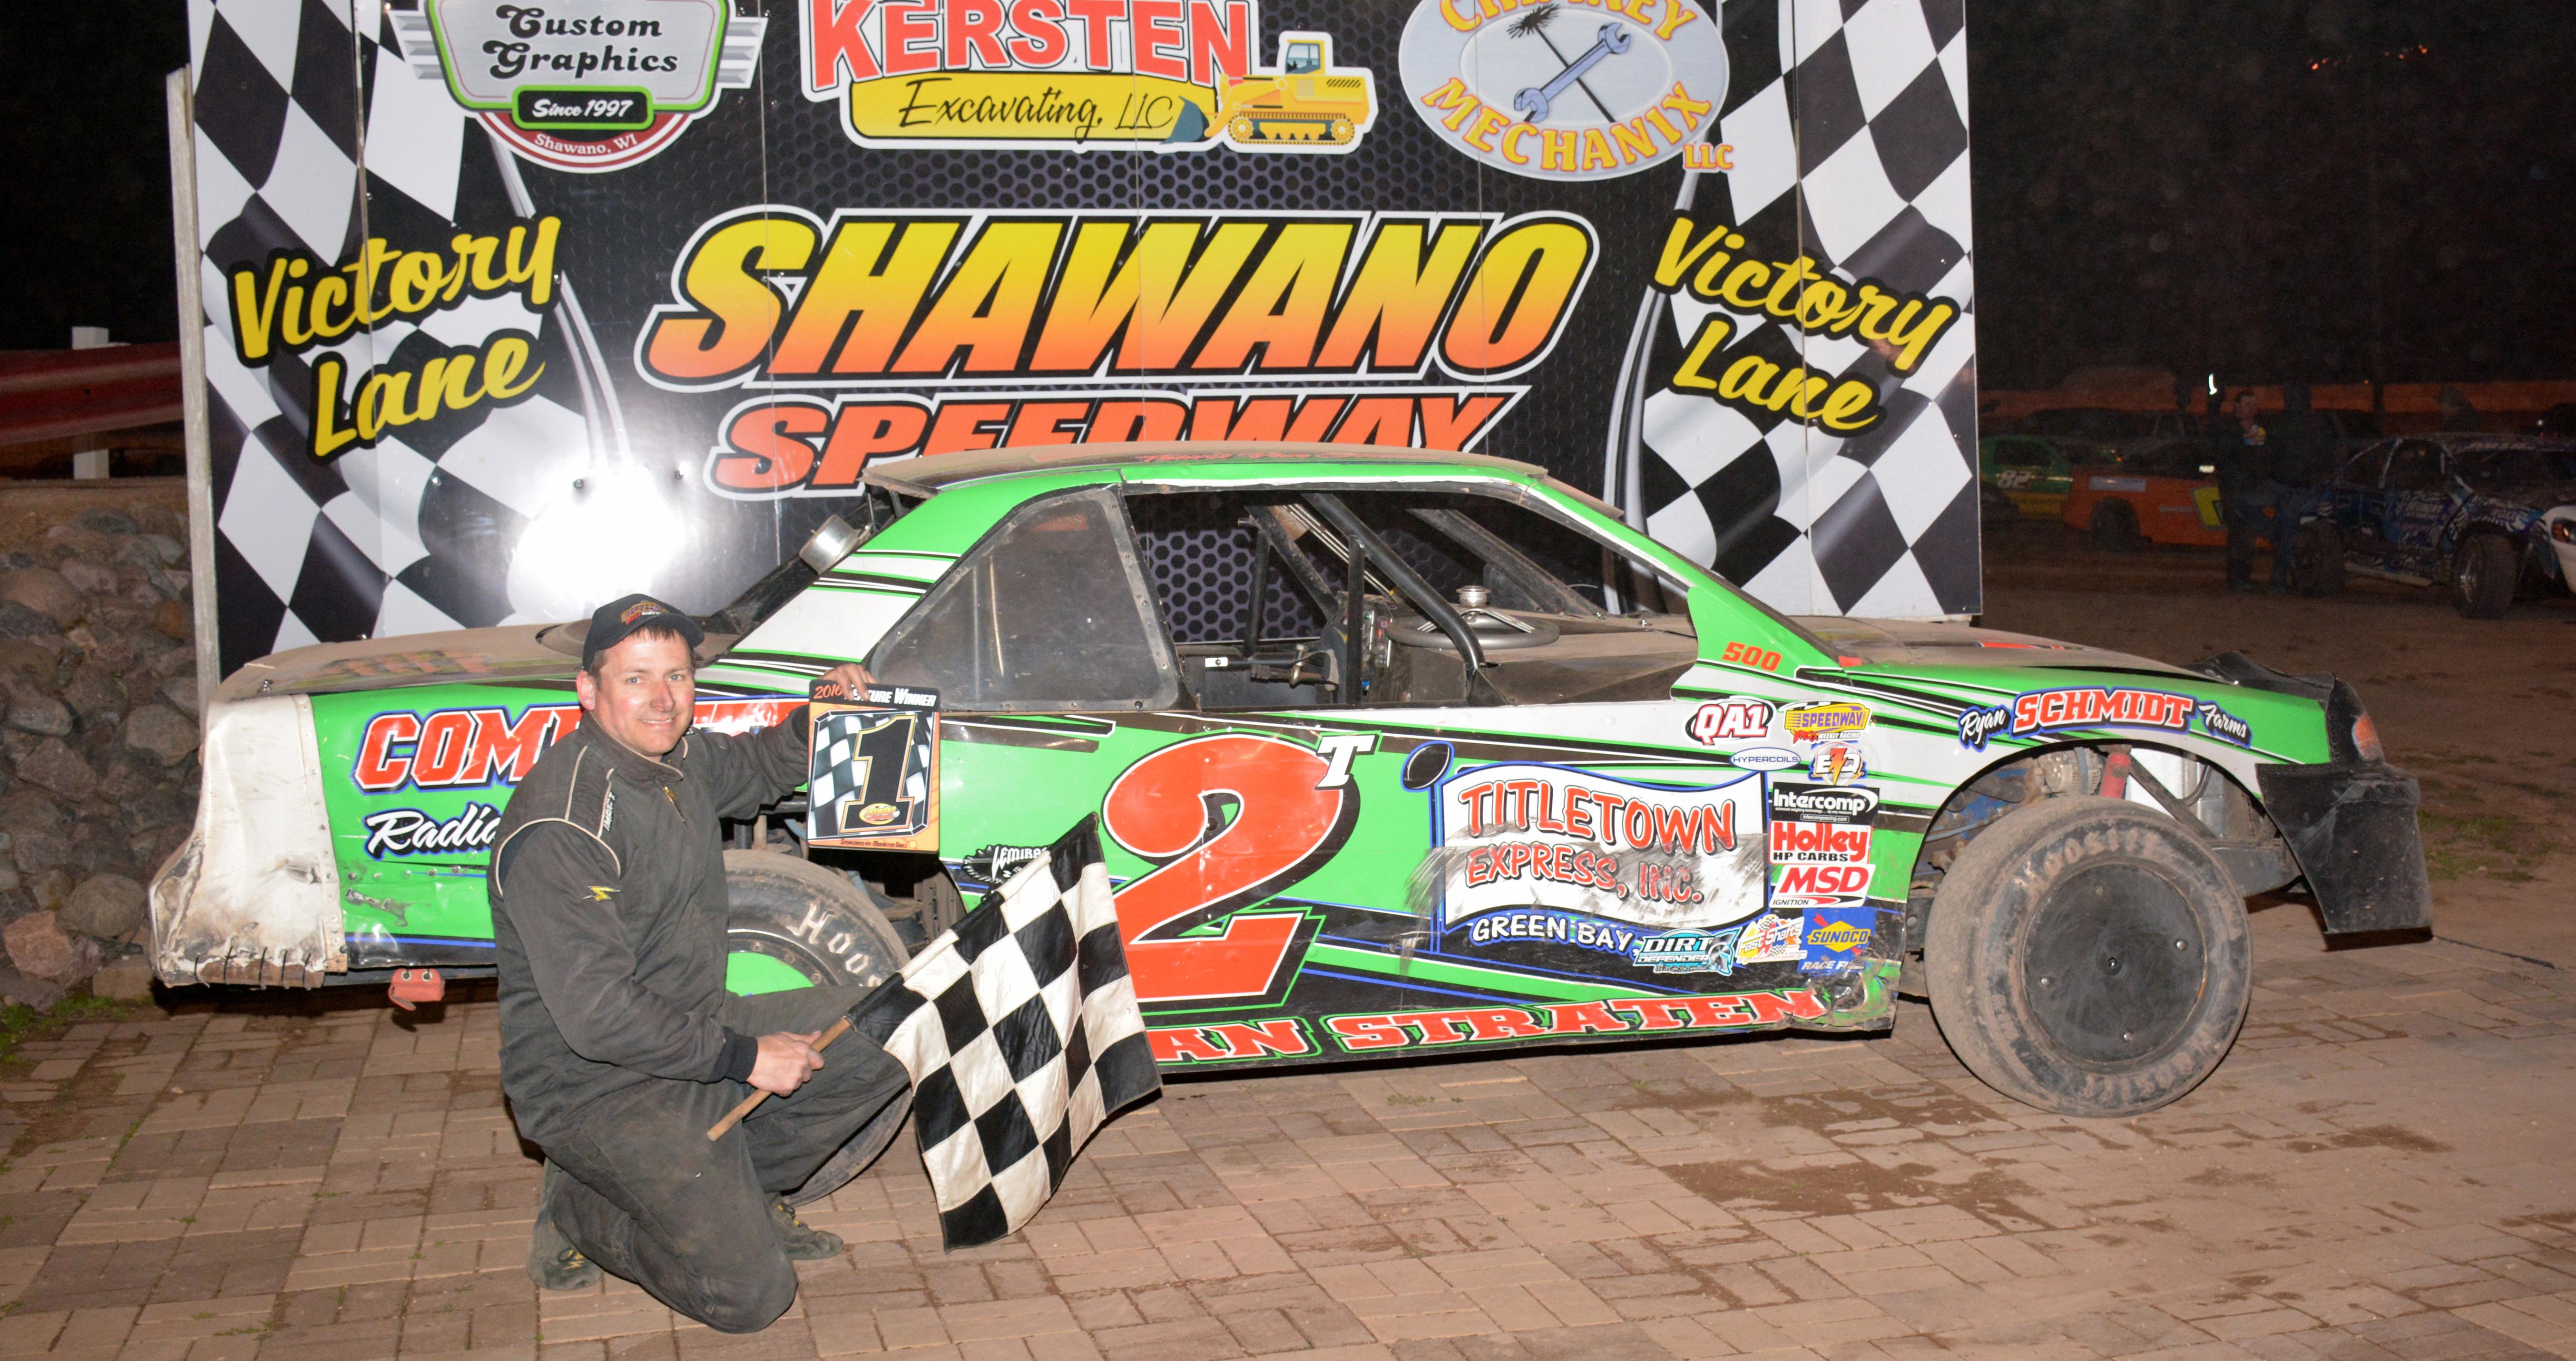 Travis Van Straten won the IMCA Stock Car feature at Shawano Speedway April 23.